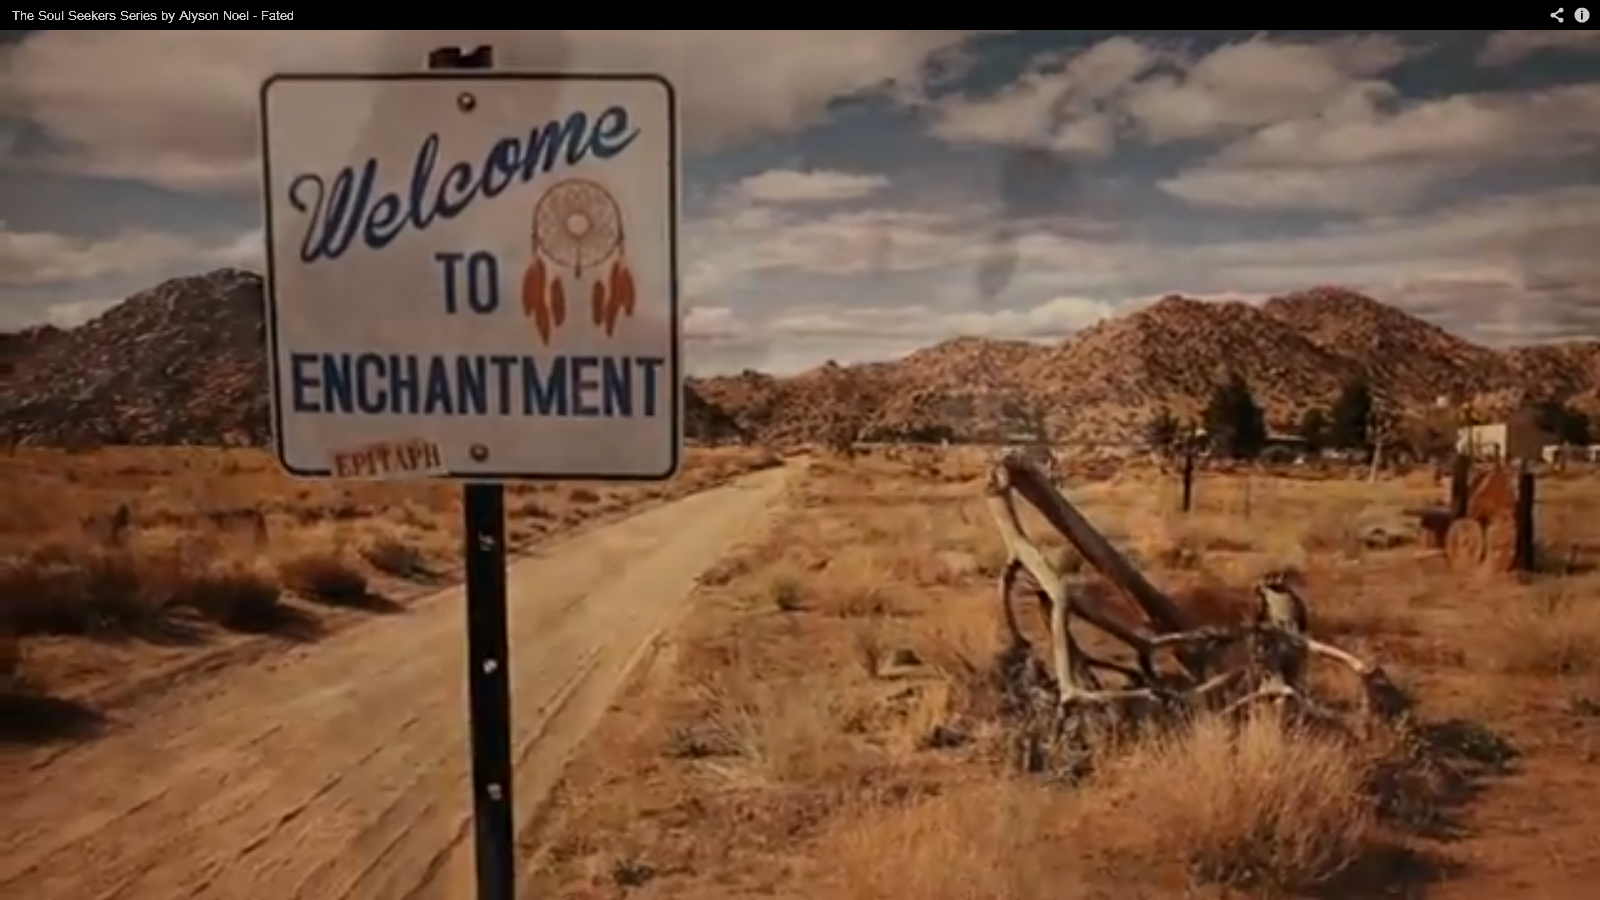 Enchantment, New Mexico